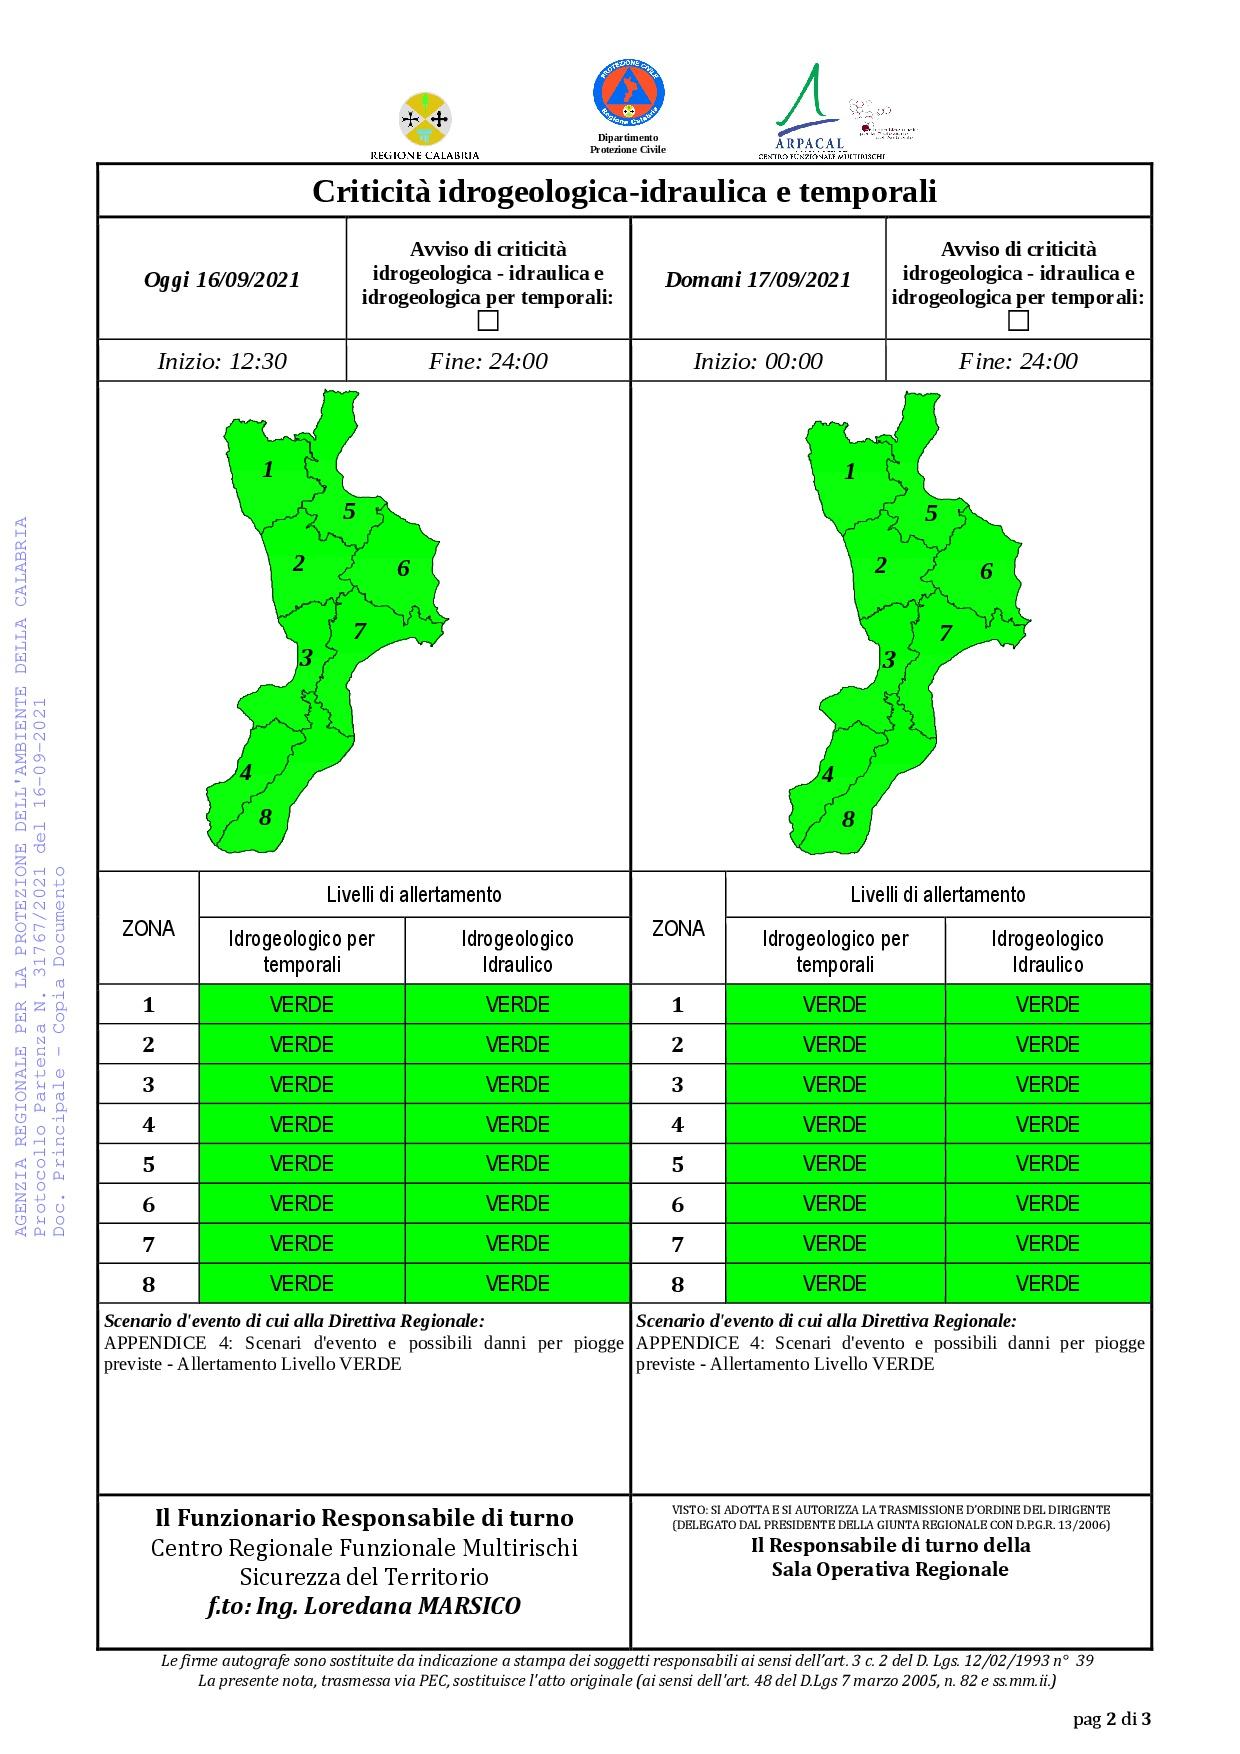 Criticità idrogeologica-idraulica e temporali in Calabria 16-09-2021